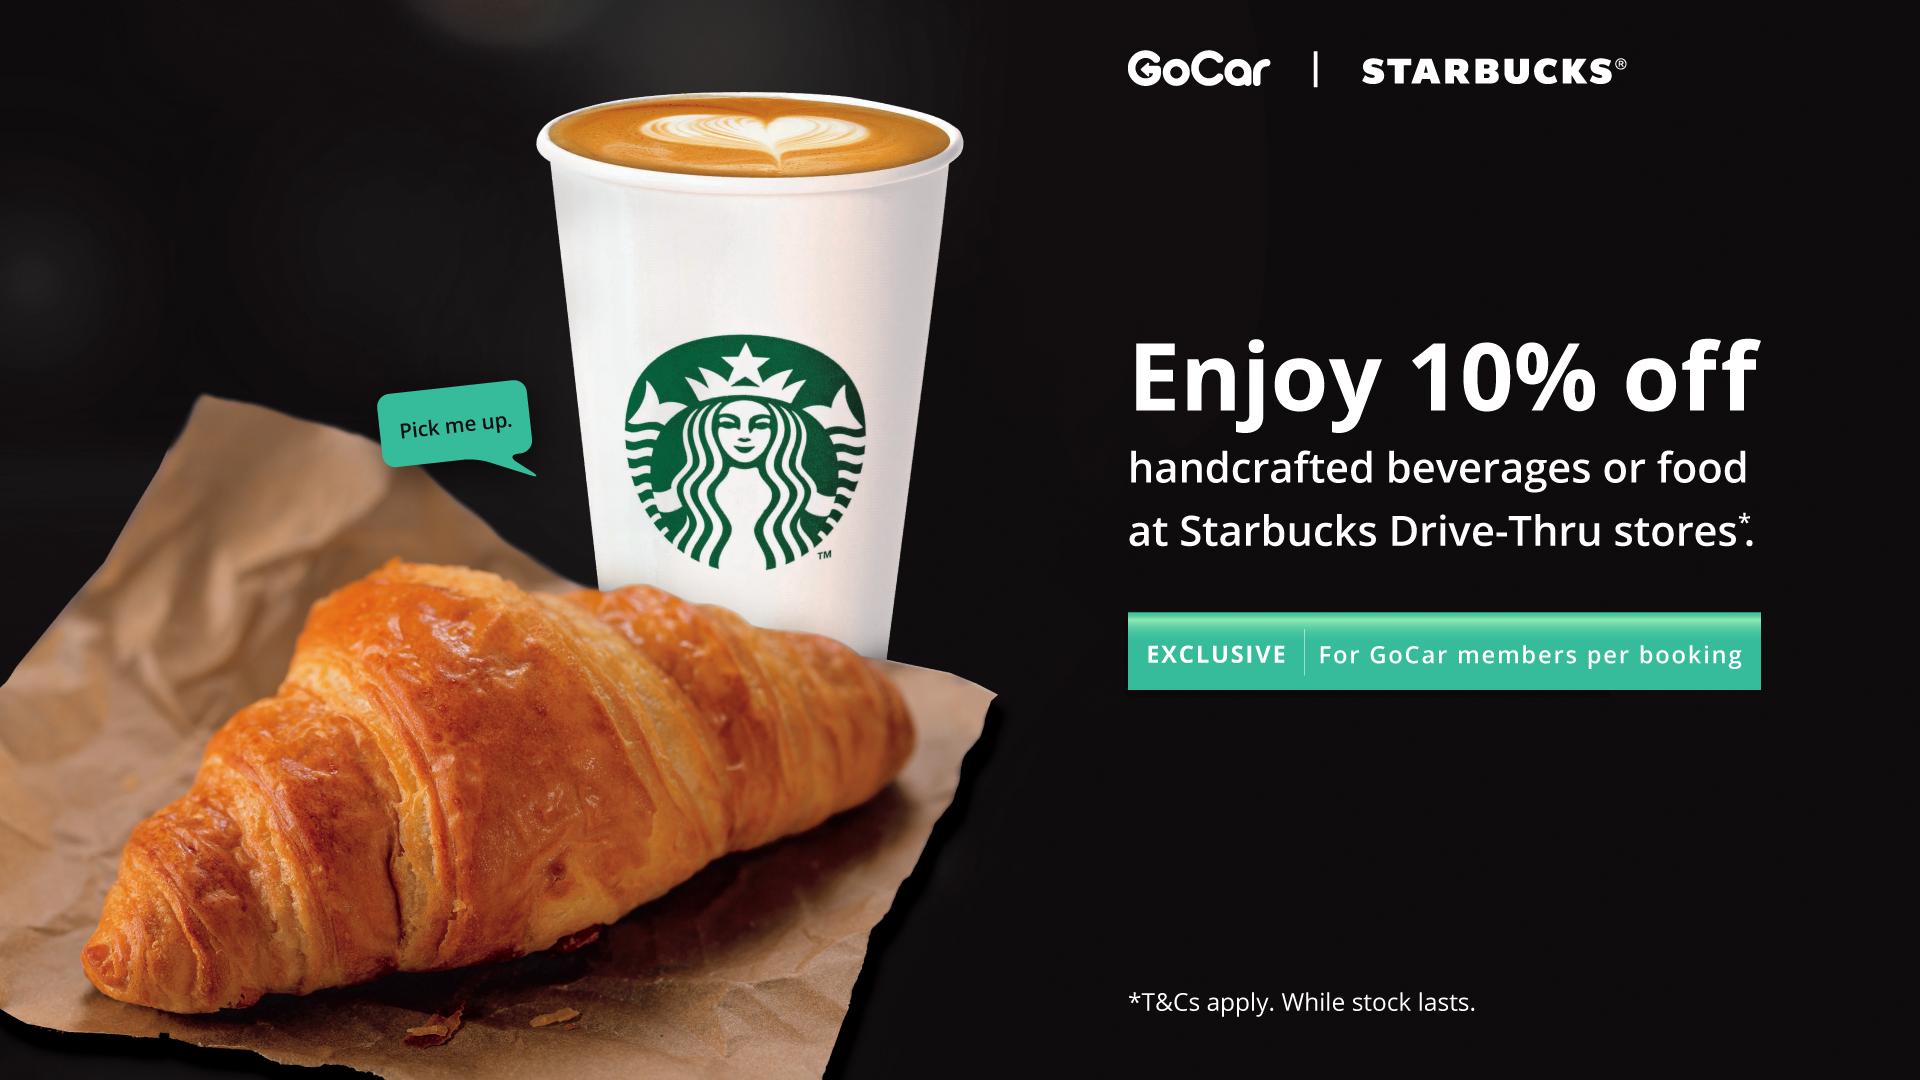 GoCar Starbucks deals